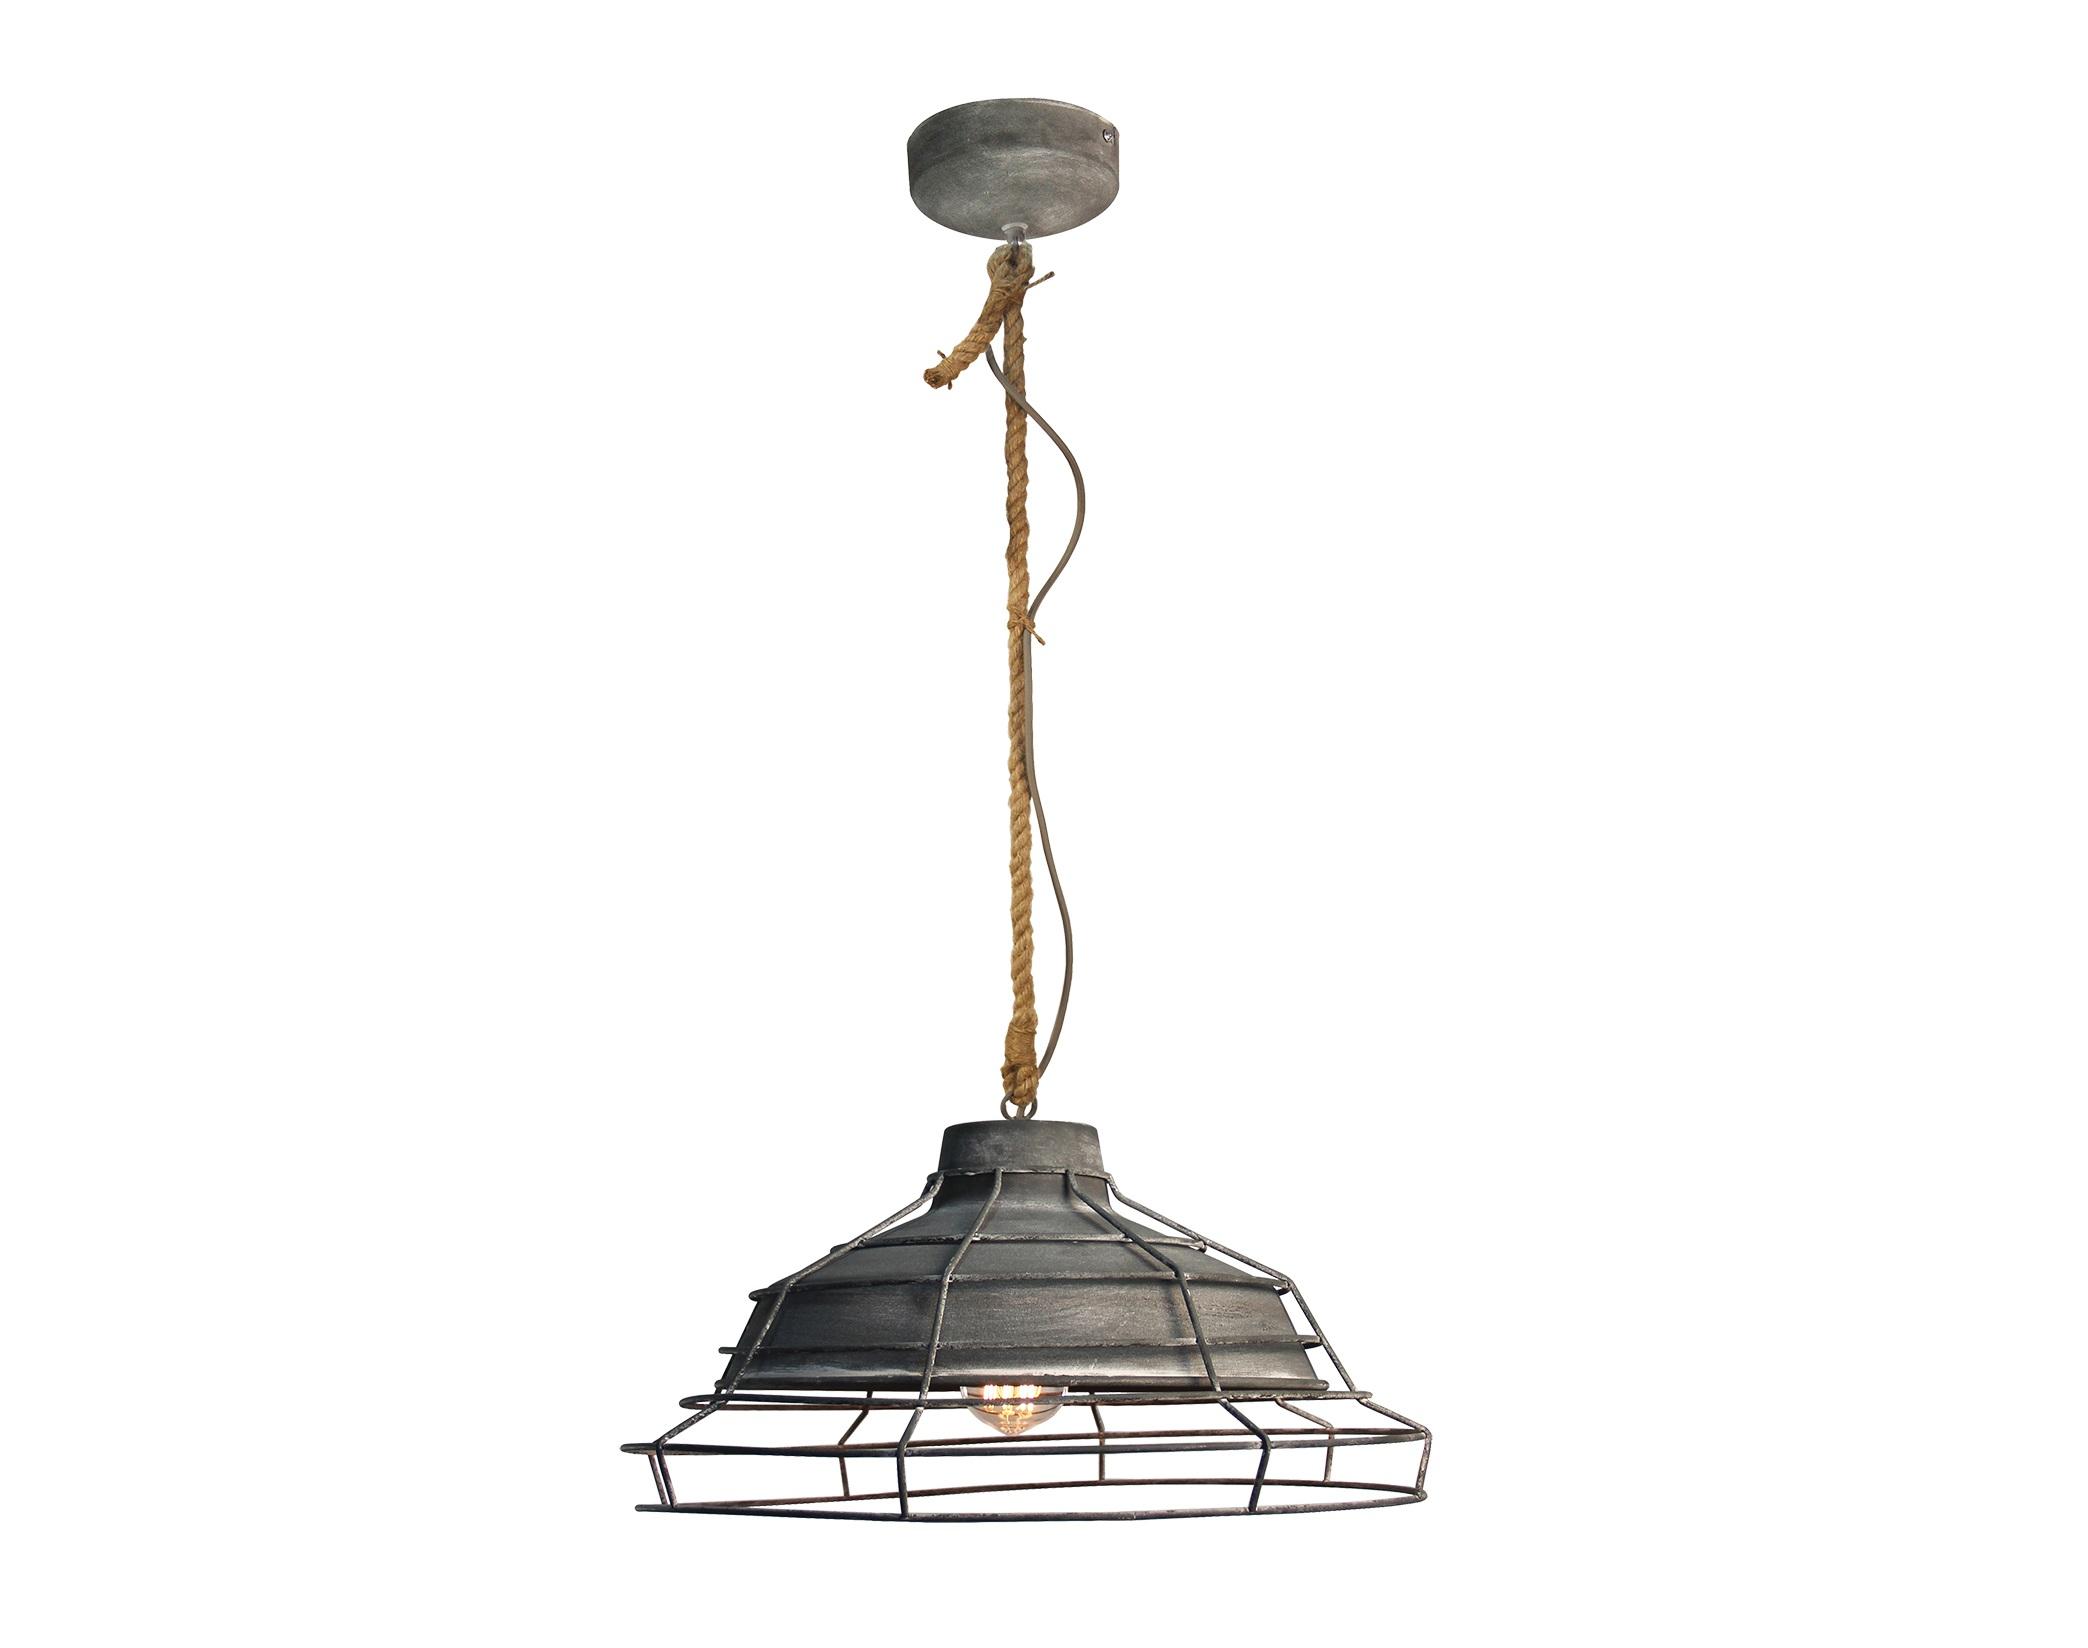 Подвесной светильникПодвесные светильники<br>&amp;lt;div&amp;gt;&amp;lt;div&amp;gt;Вид цоколя: E27&amp;lt;/div&amp;gt;&amp;lt;div&amp;gt;Мощность: 60W&amp;lt;/div&amp;gt;&amp;lt;div&amp;gt;Количество ламп: 1&amp;lt;/div&amp;gt;&amp;lt;div&amp;gt;Наличие ламп: отсутствуют.&amp;lt;/div&amp;gt;&amp;lt;/div&amp;gt;<br><br>Material: Металл<br>Высота см: 120